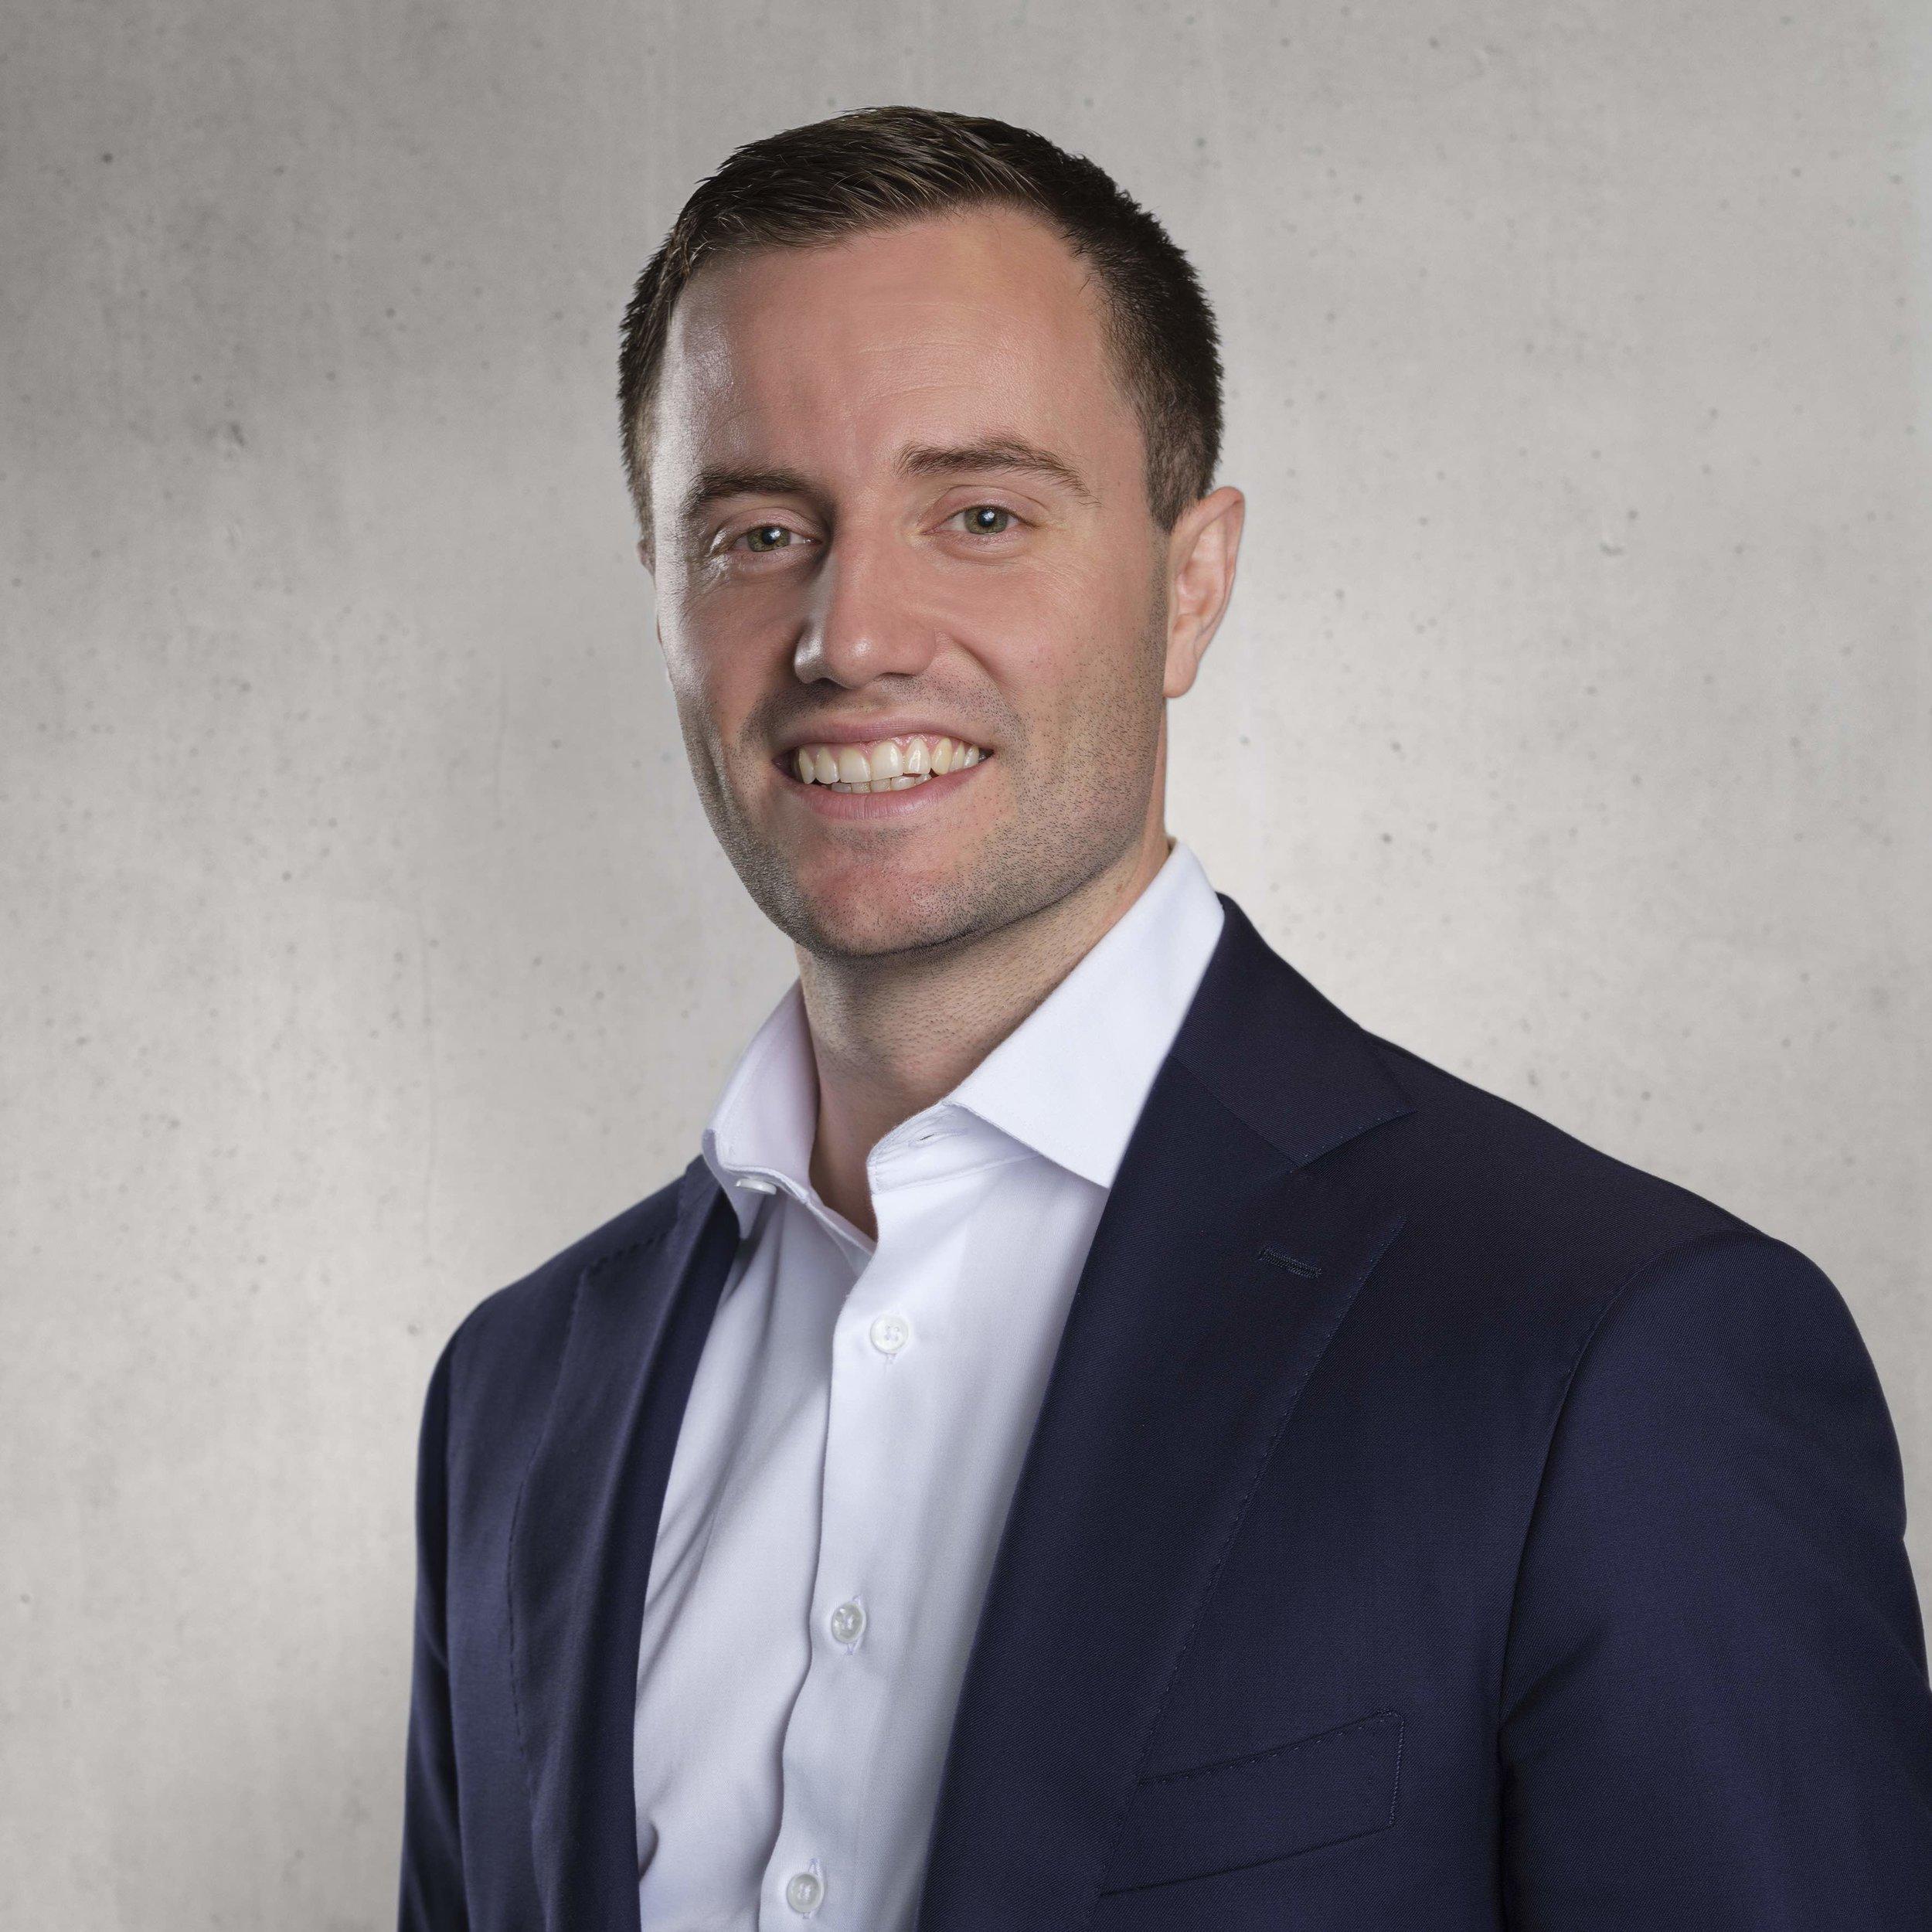 David Straumann, Partner - Investment Solutionsemail: david.straumann@anovapartners.comdirect no.: +41 44 215 24 77